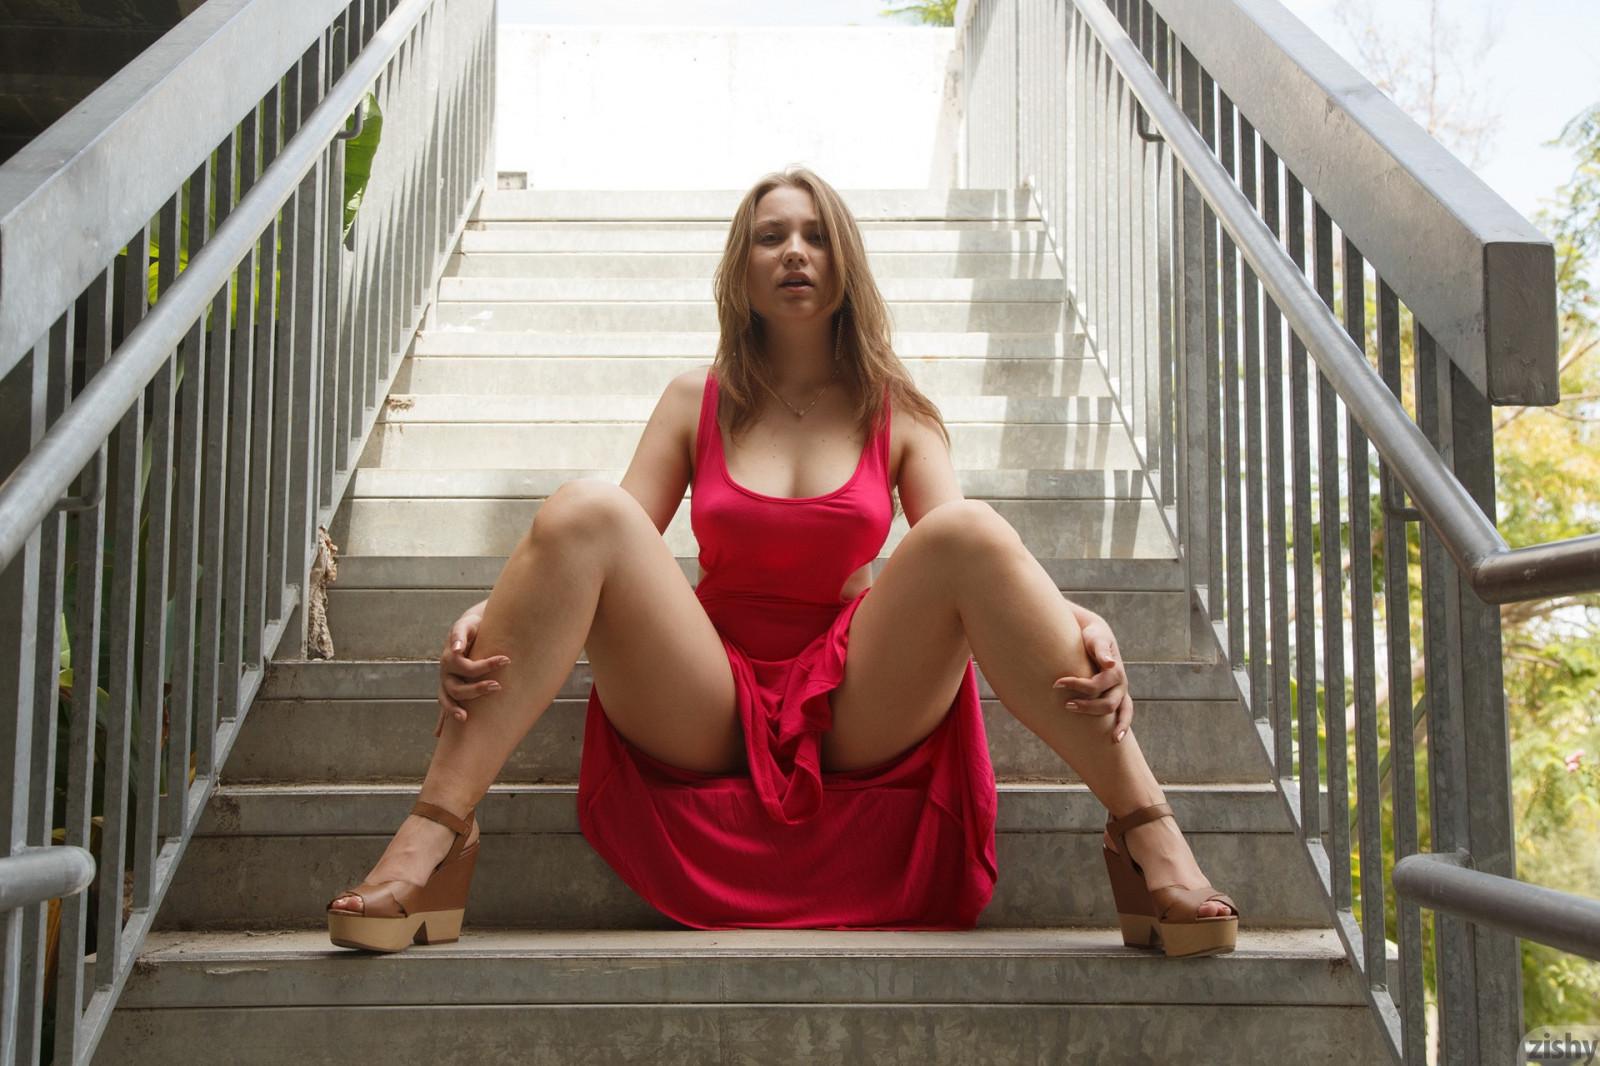 Женщина голая сидит раздвинув ноги, фото брюнеток лесбиянок домашнее